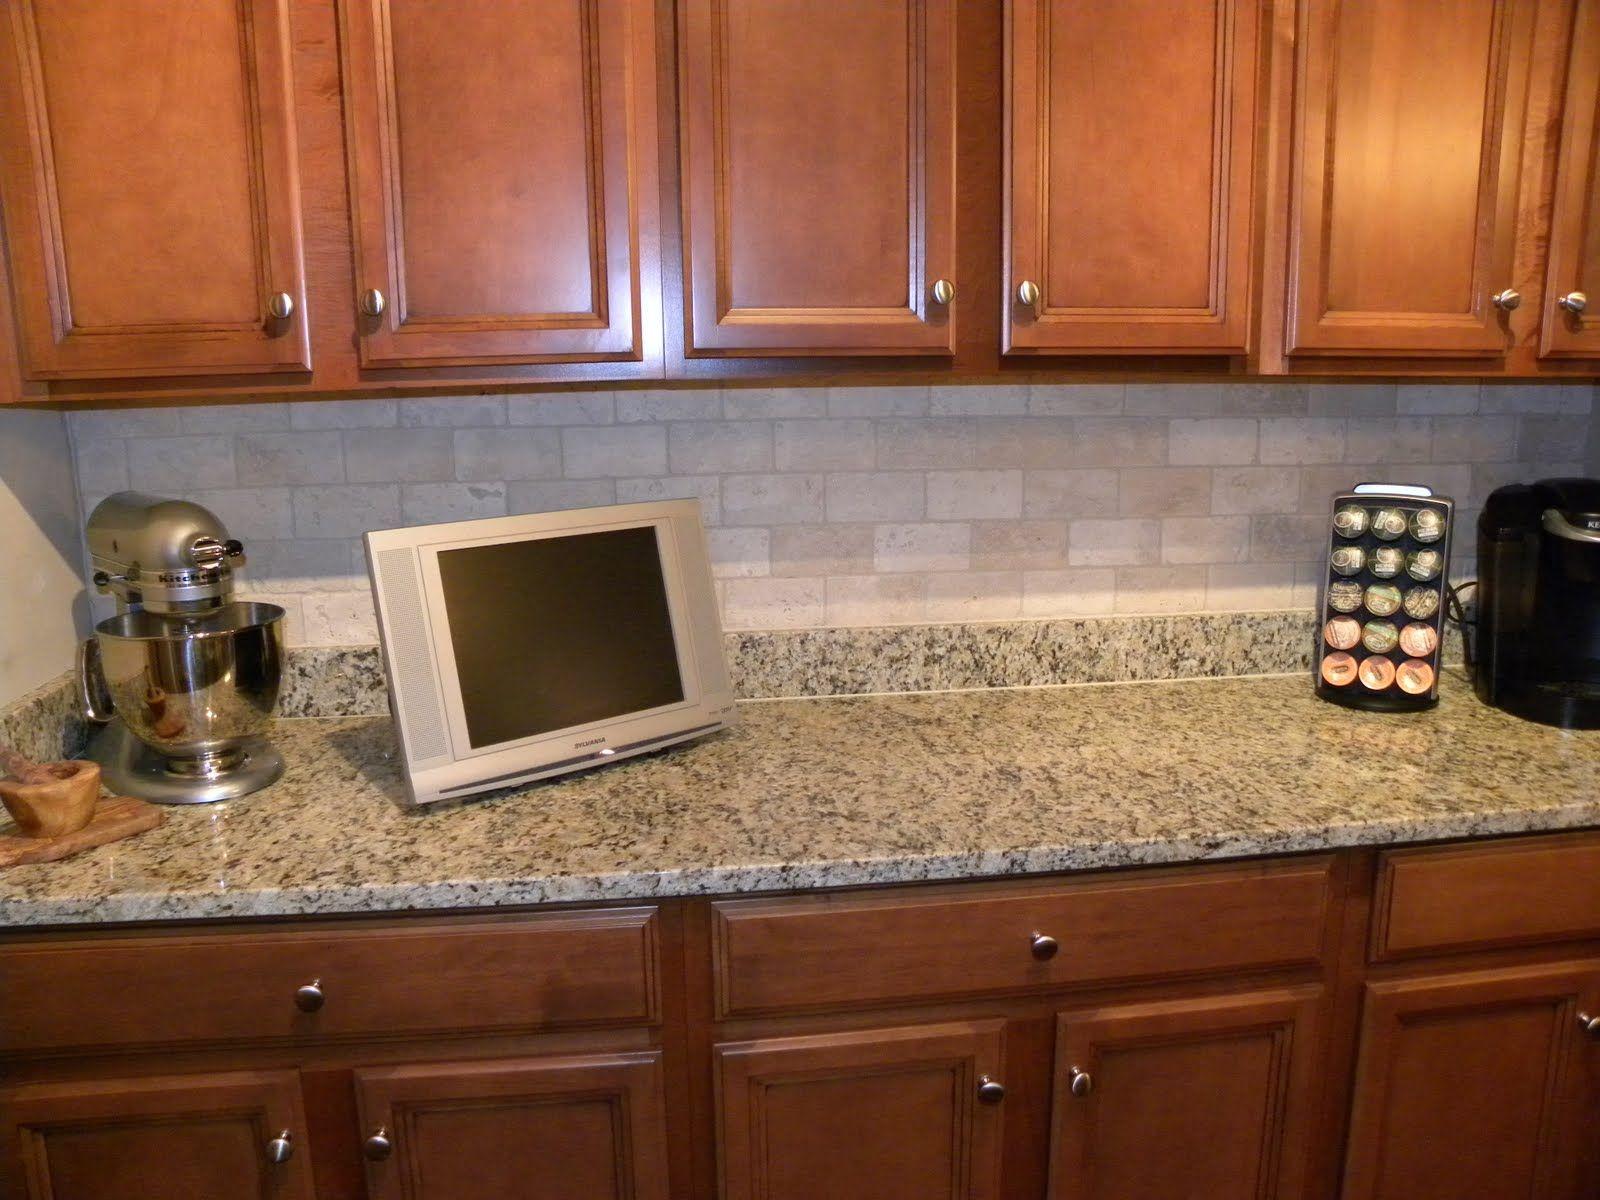 High Quality 10 Different Ways For Diy Kitchen Backsplash